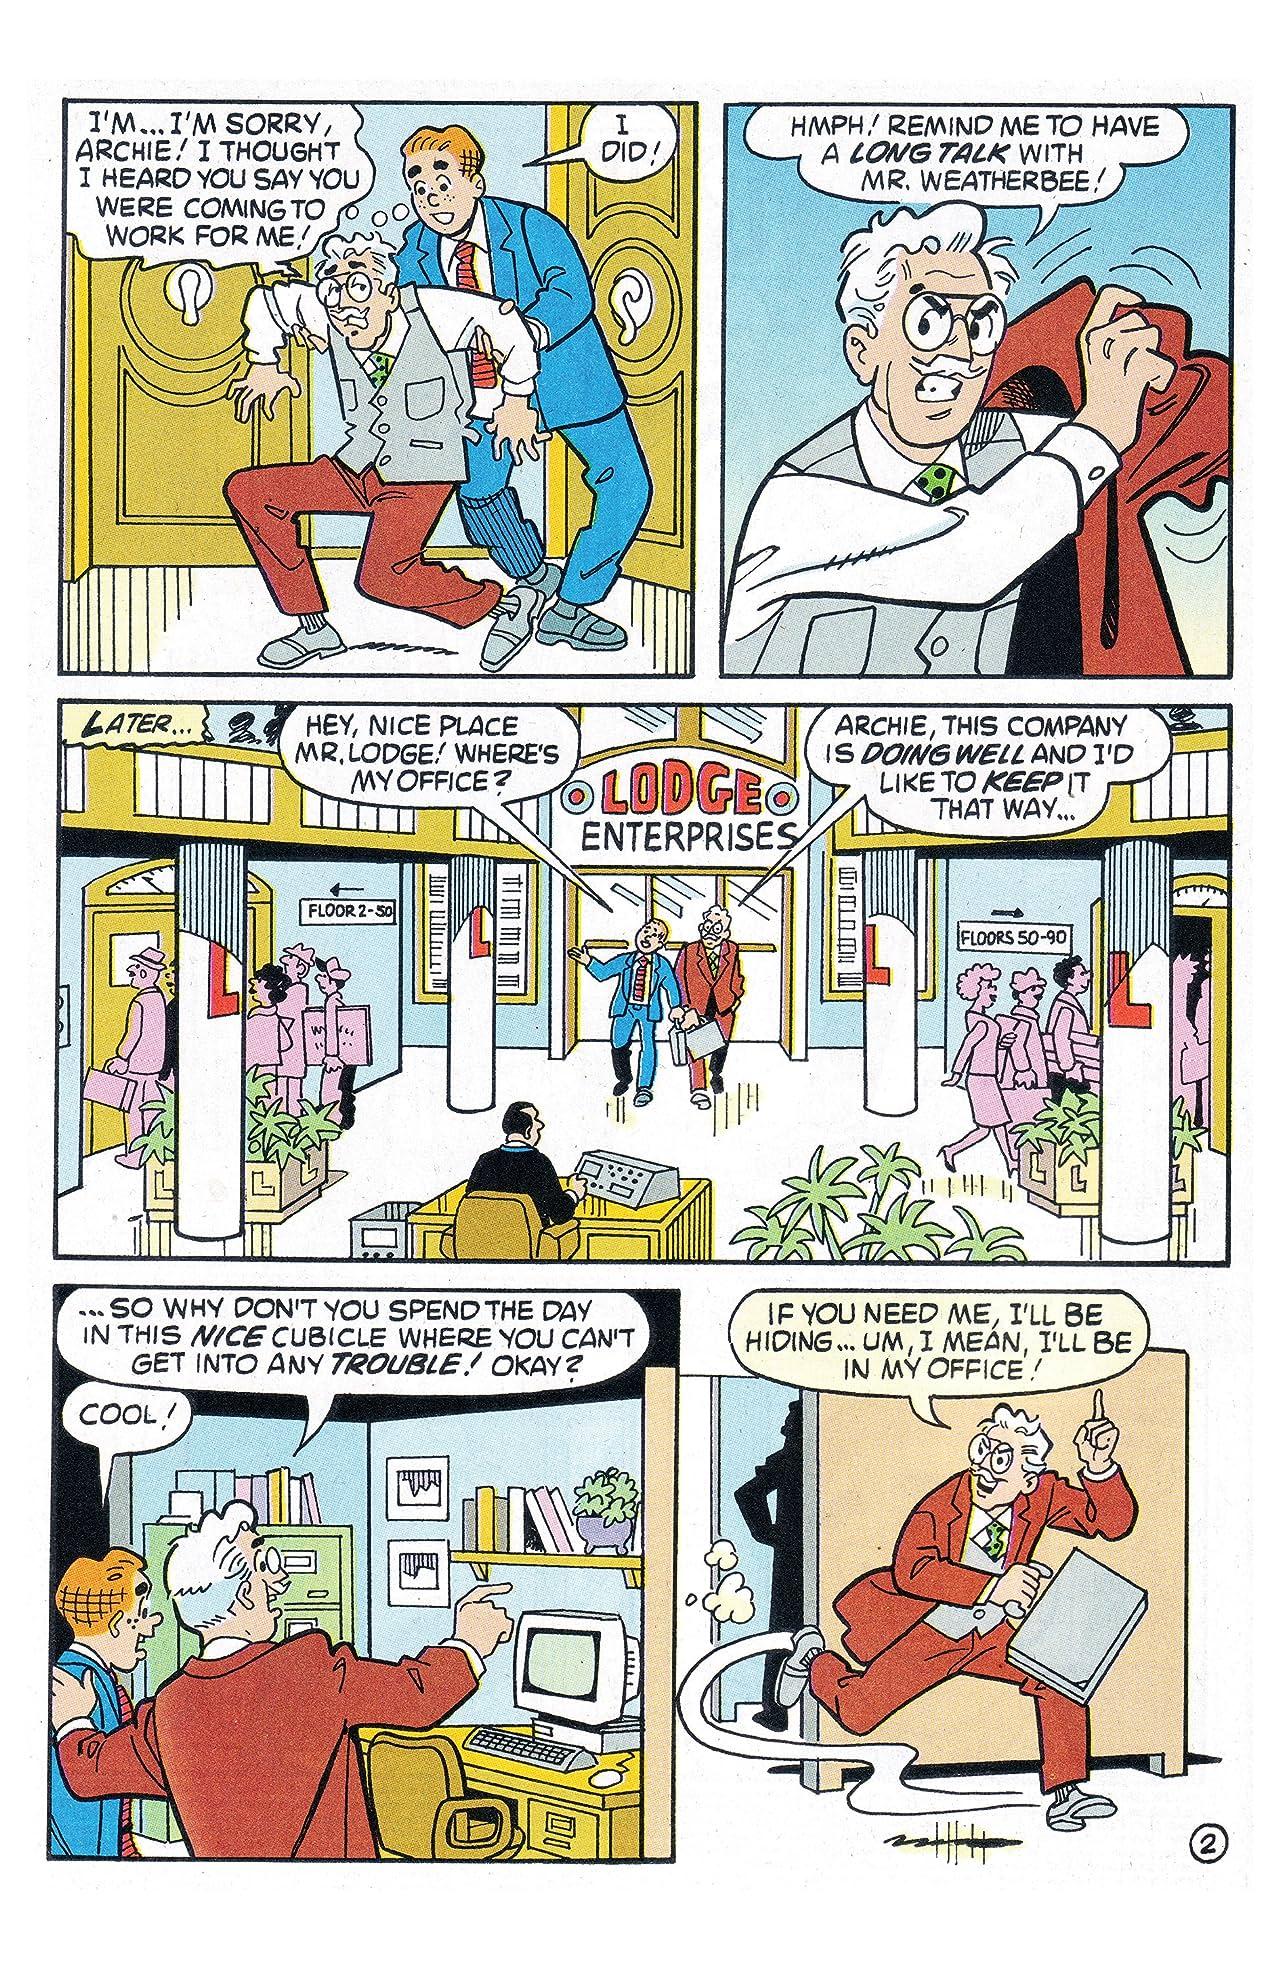 Archie #472